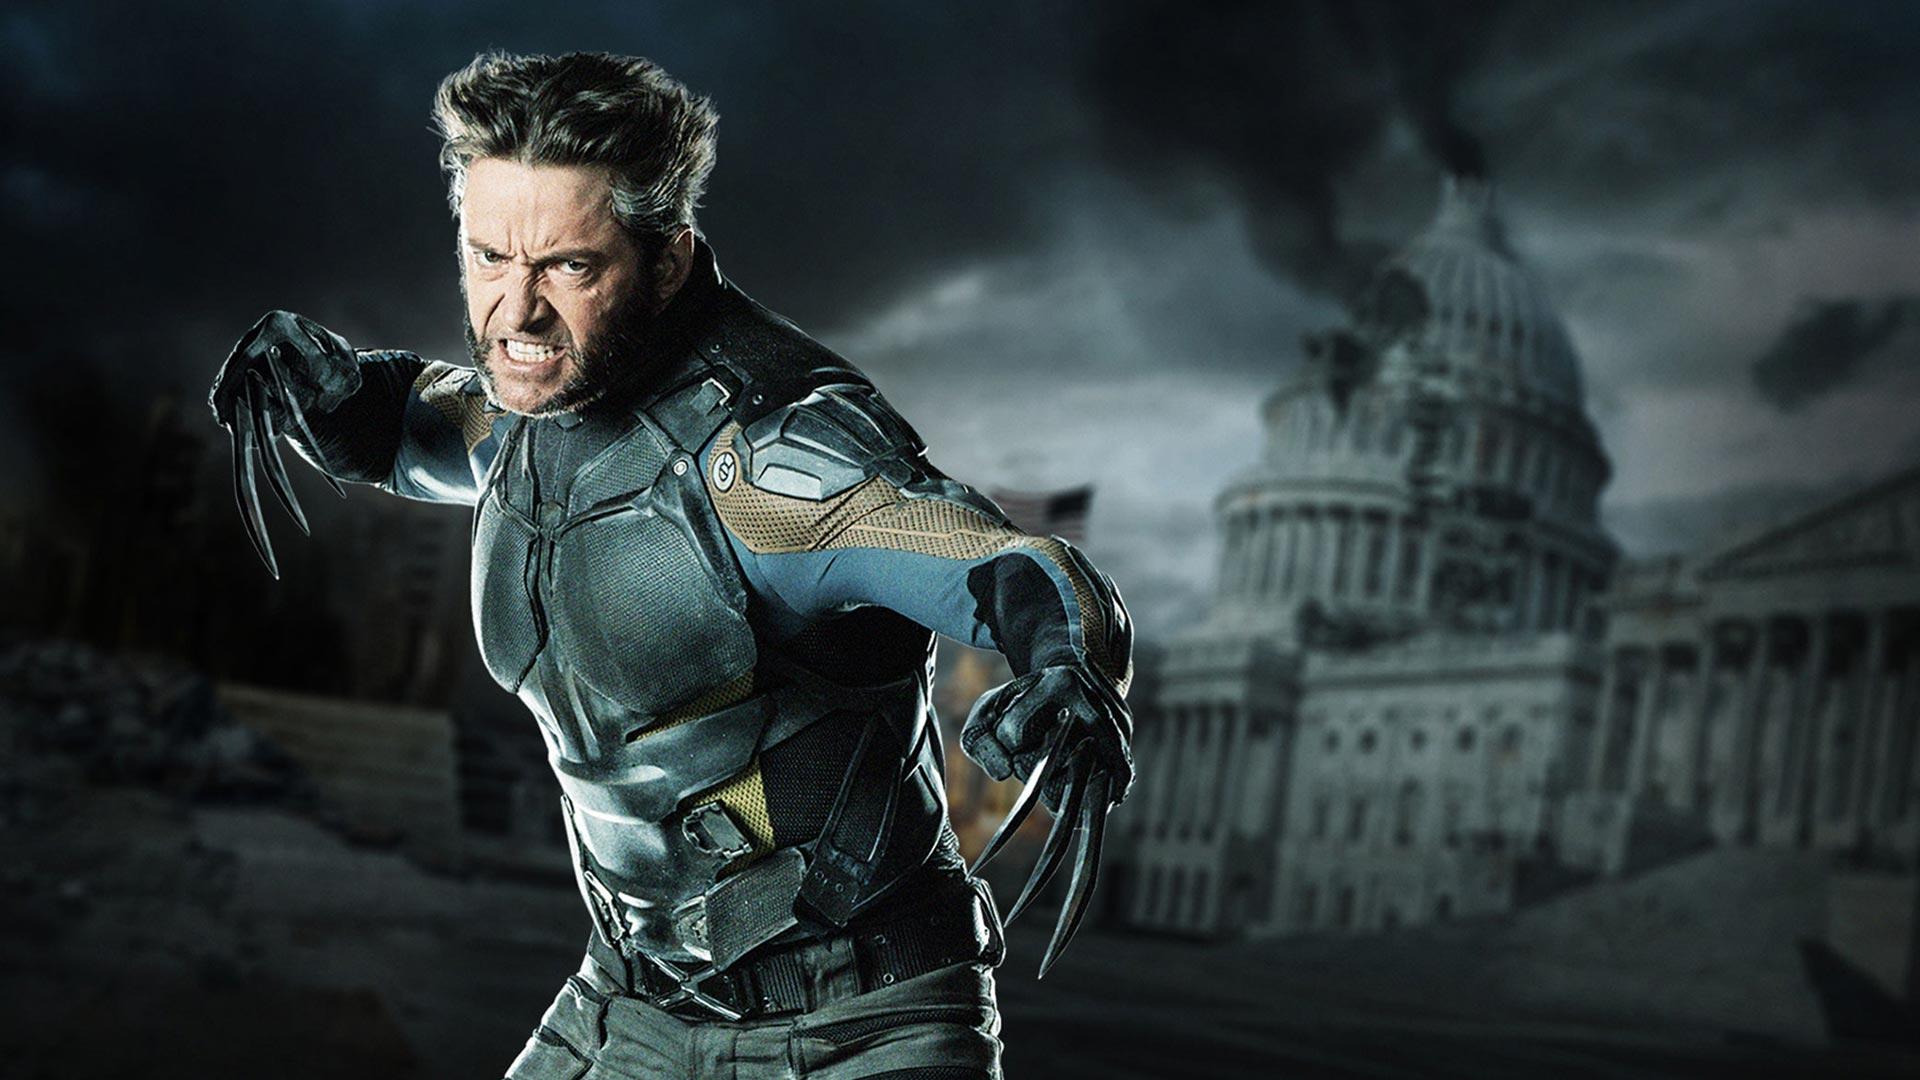 X Men Days of Future Past Movie 2014 HD iPad iPhone 1920x1080